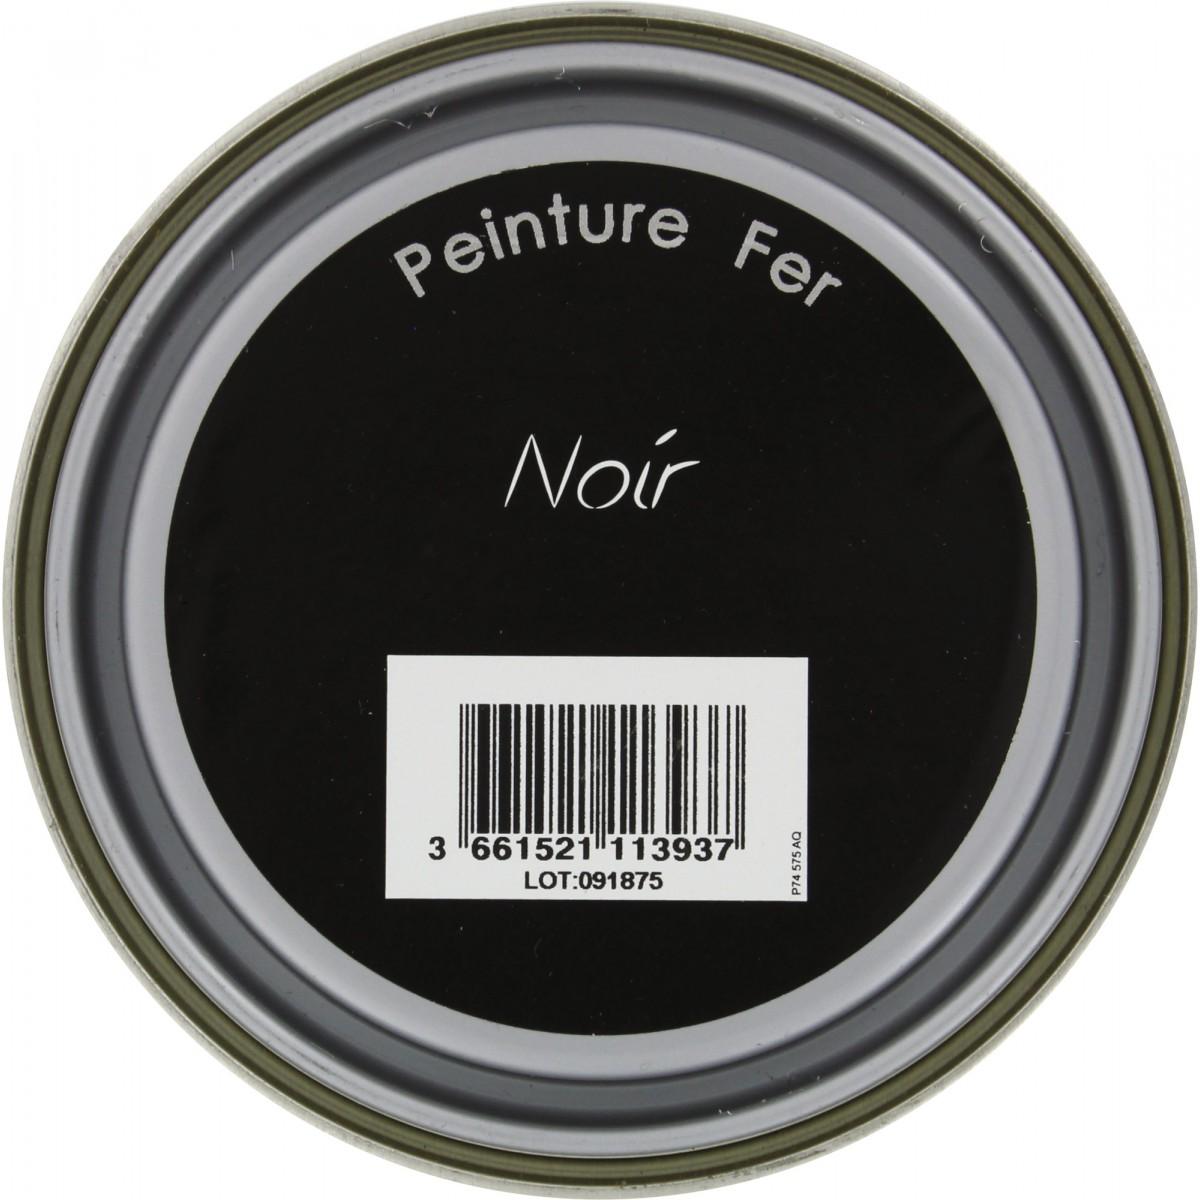 Peinture fer Addict - 0,5 l - Noir profond